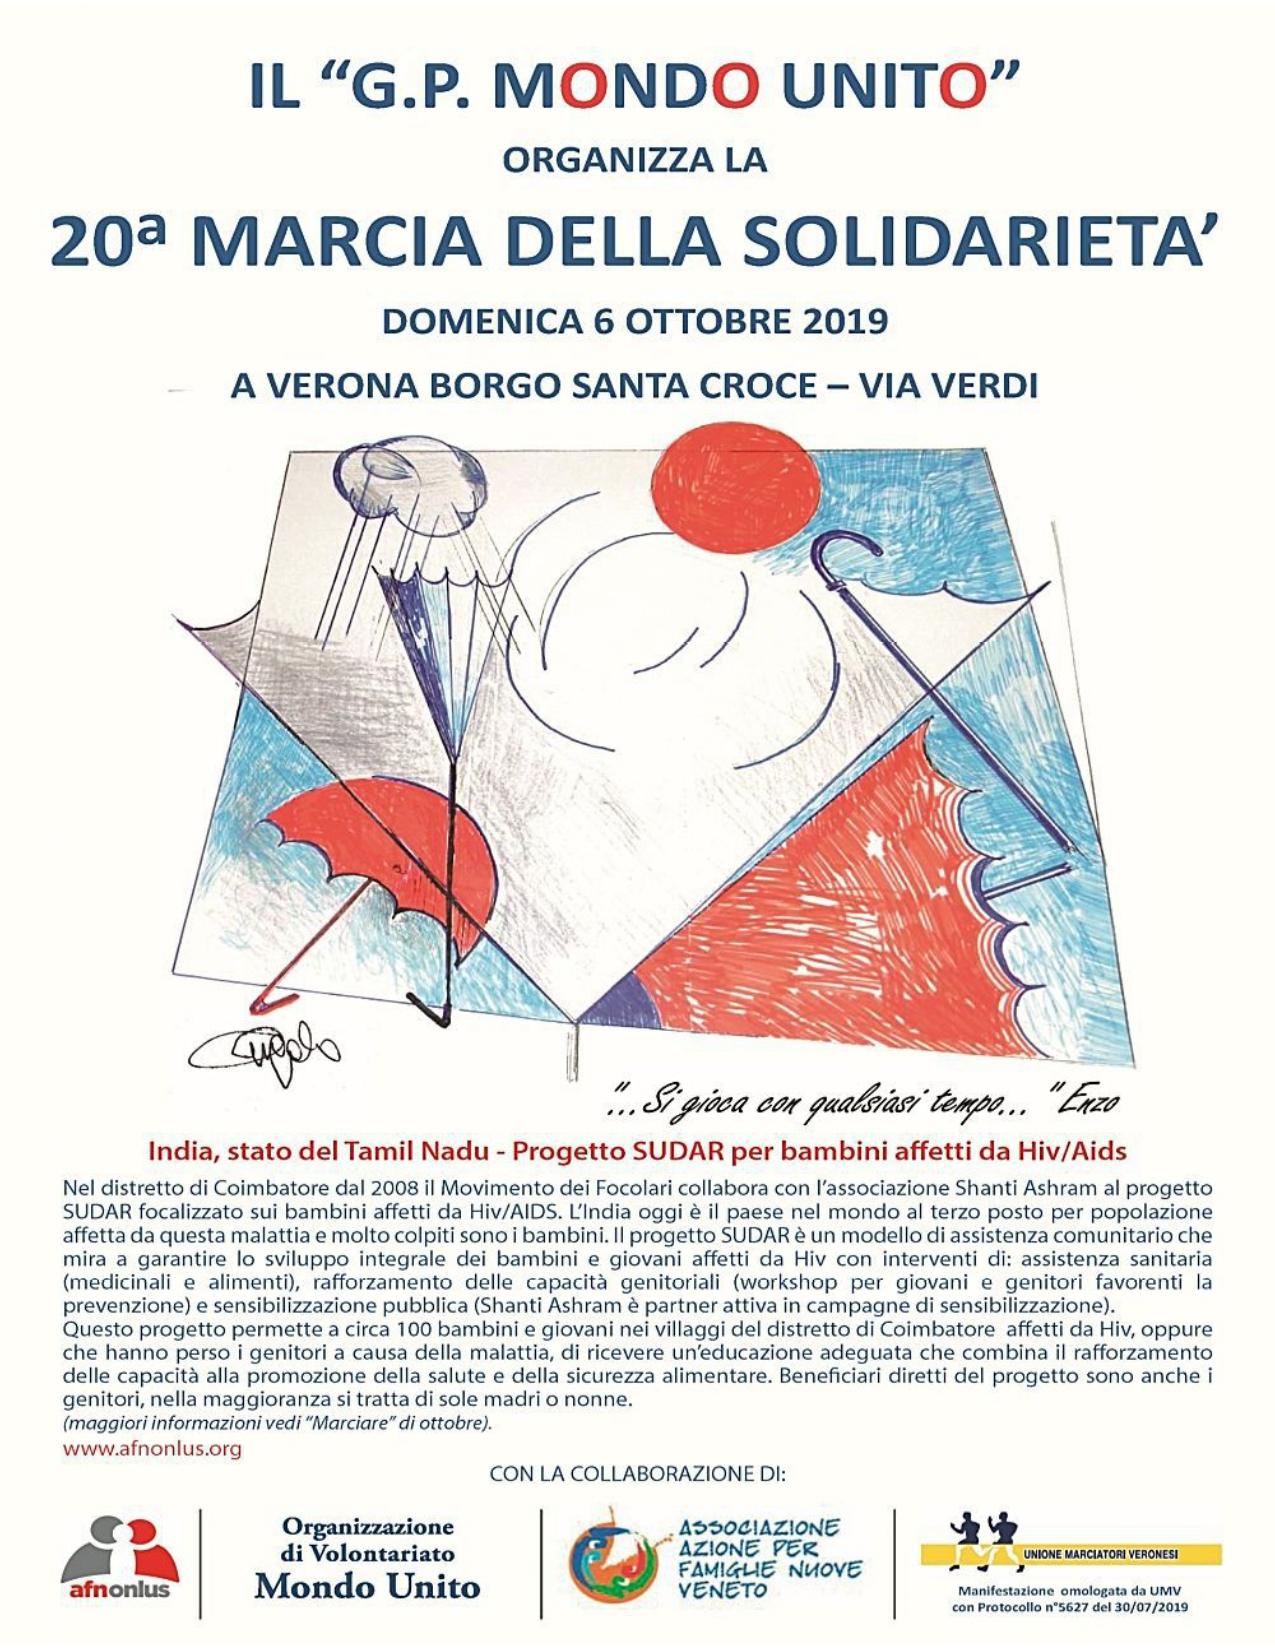 Unione Marciatori Veronesi Calendario.Verona 20a Marcia Di Solidarieta Focolaritalia It